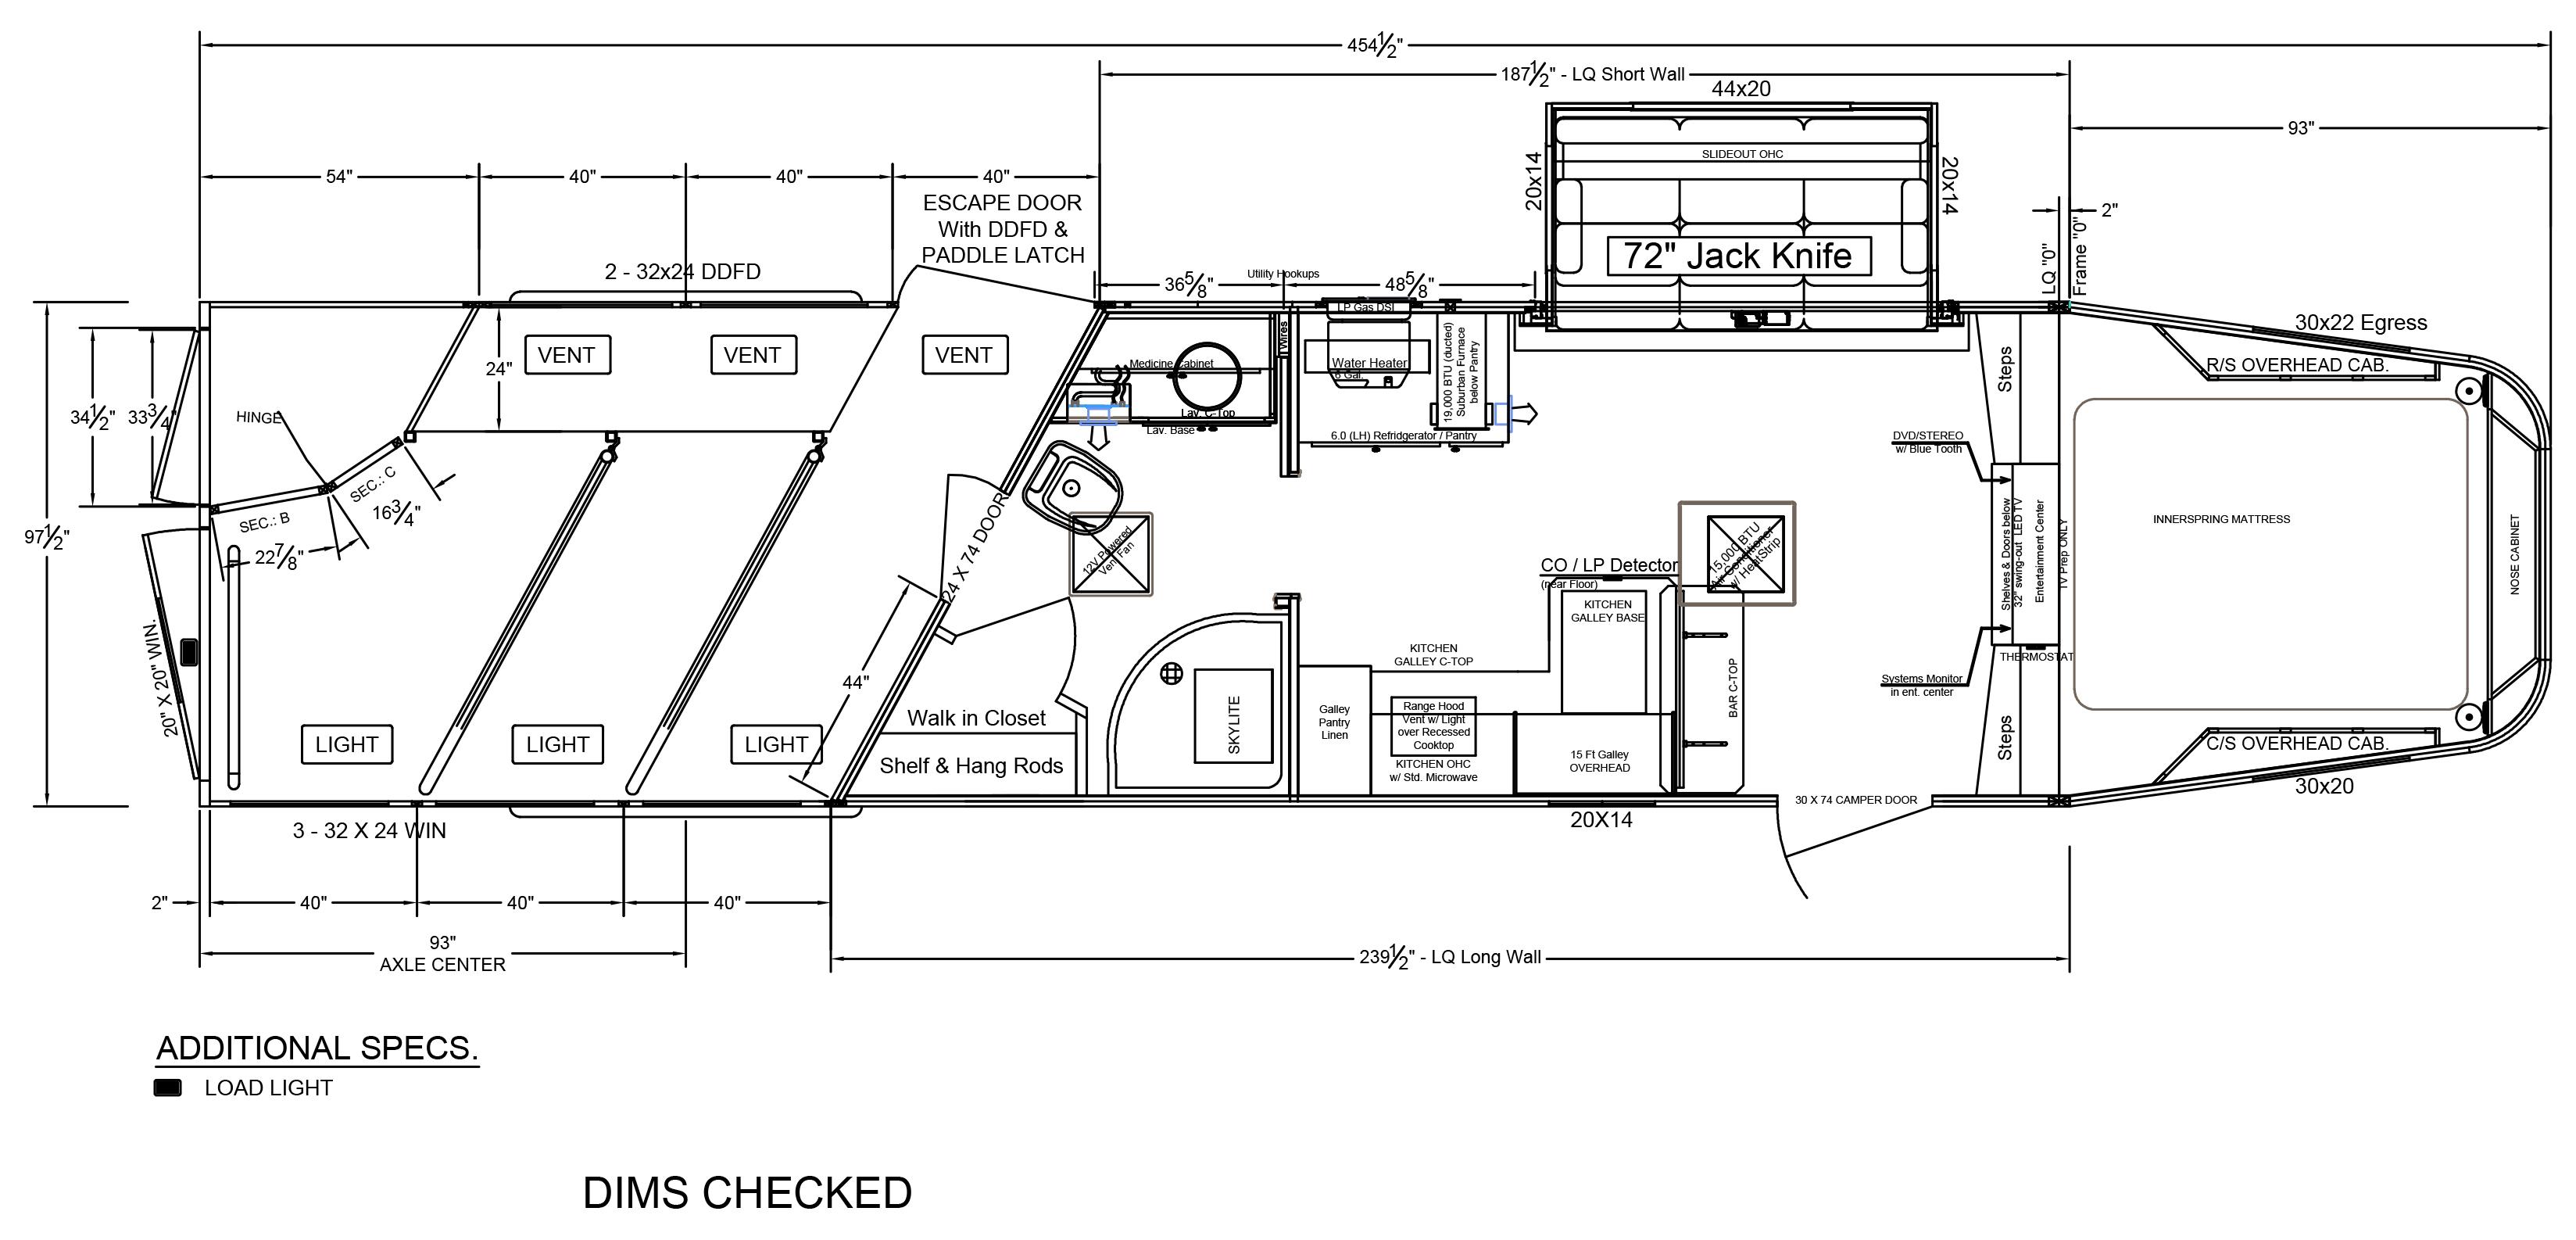 floorplans merhowmerhow 8315 rk s dual aisle